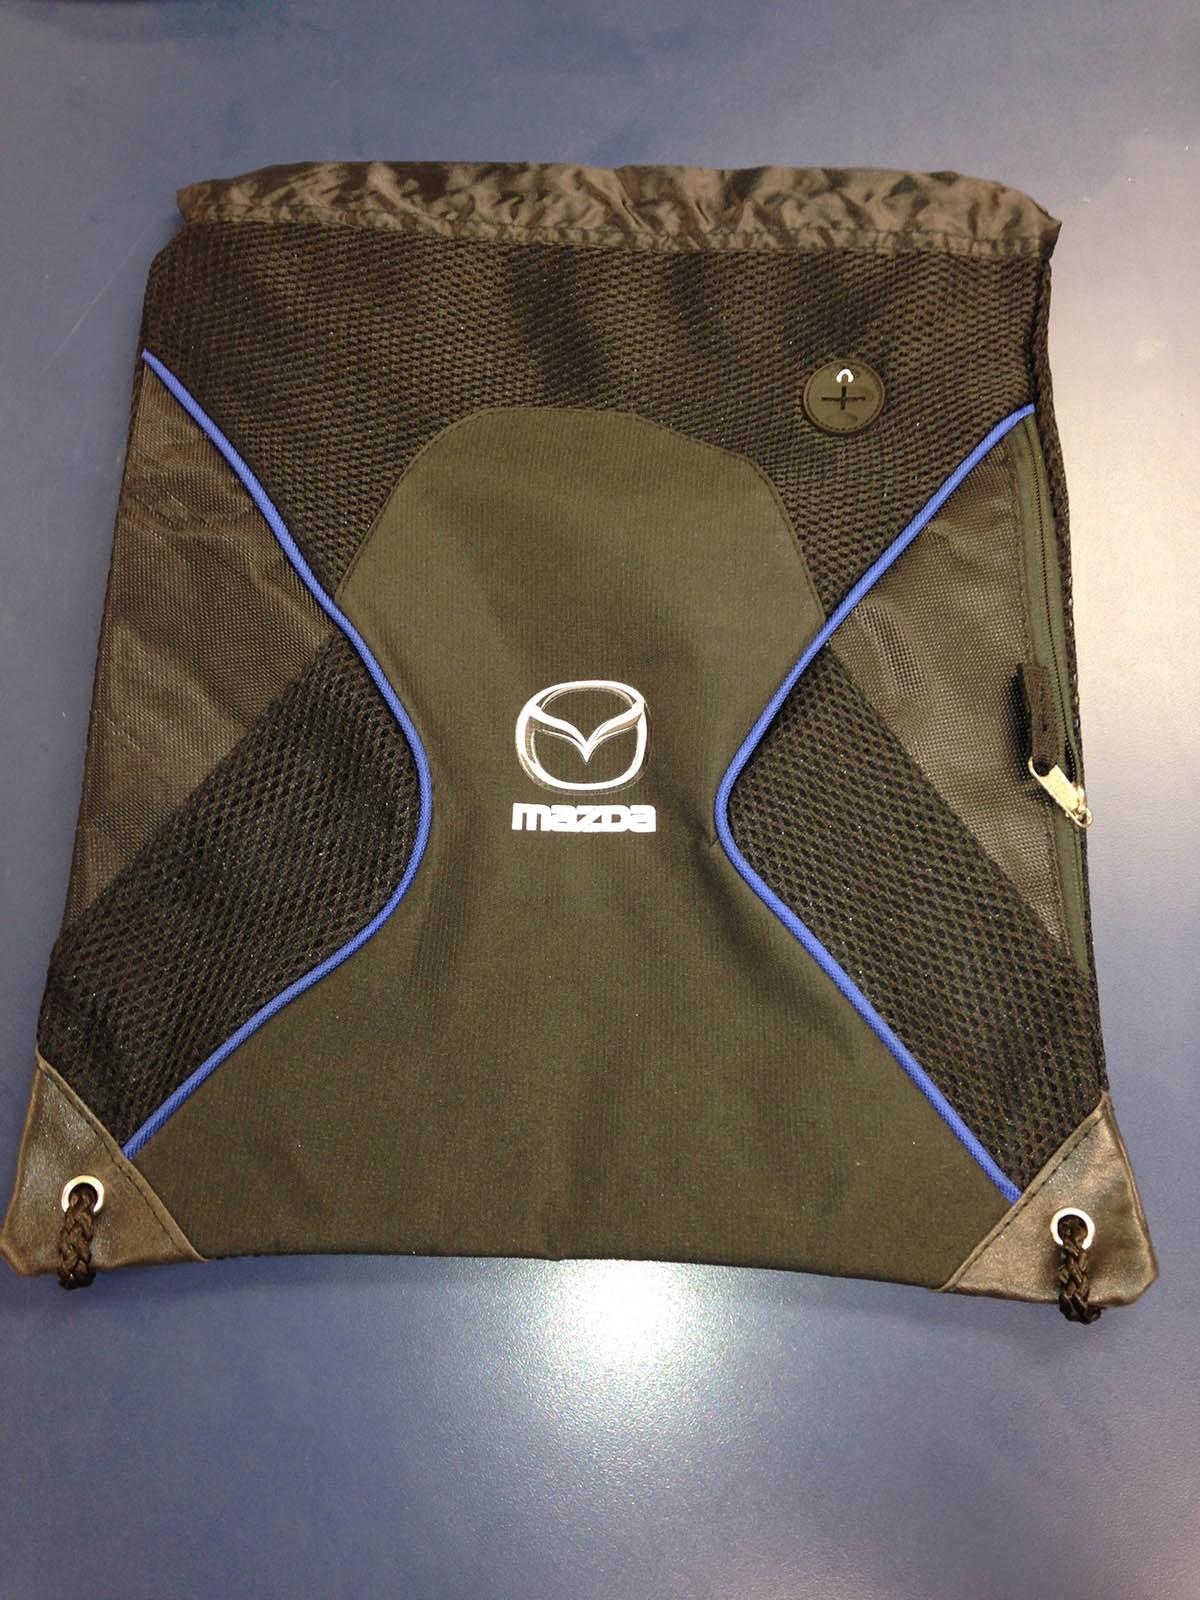 Mazda Cinch Bag